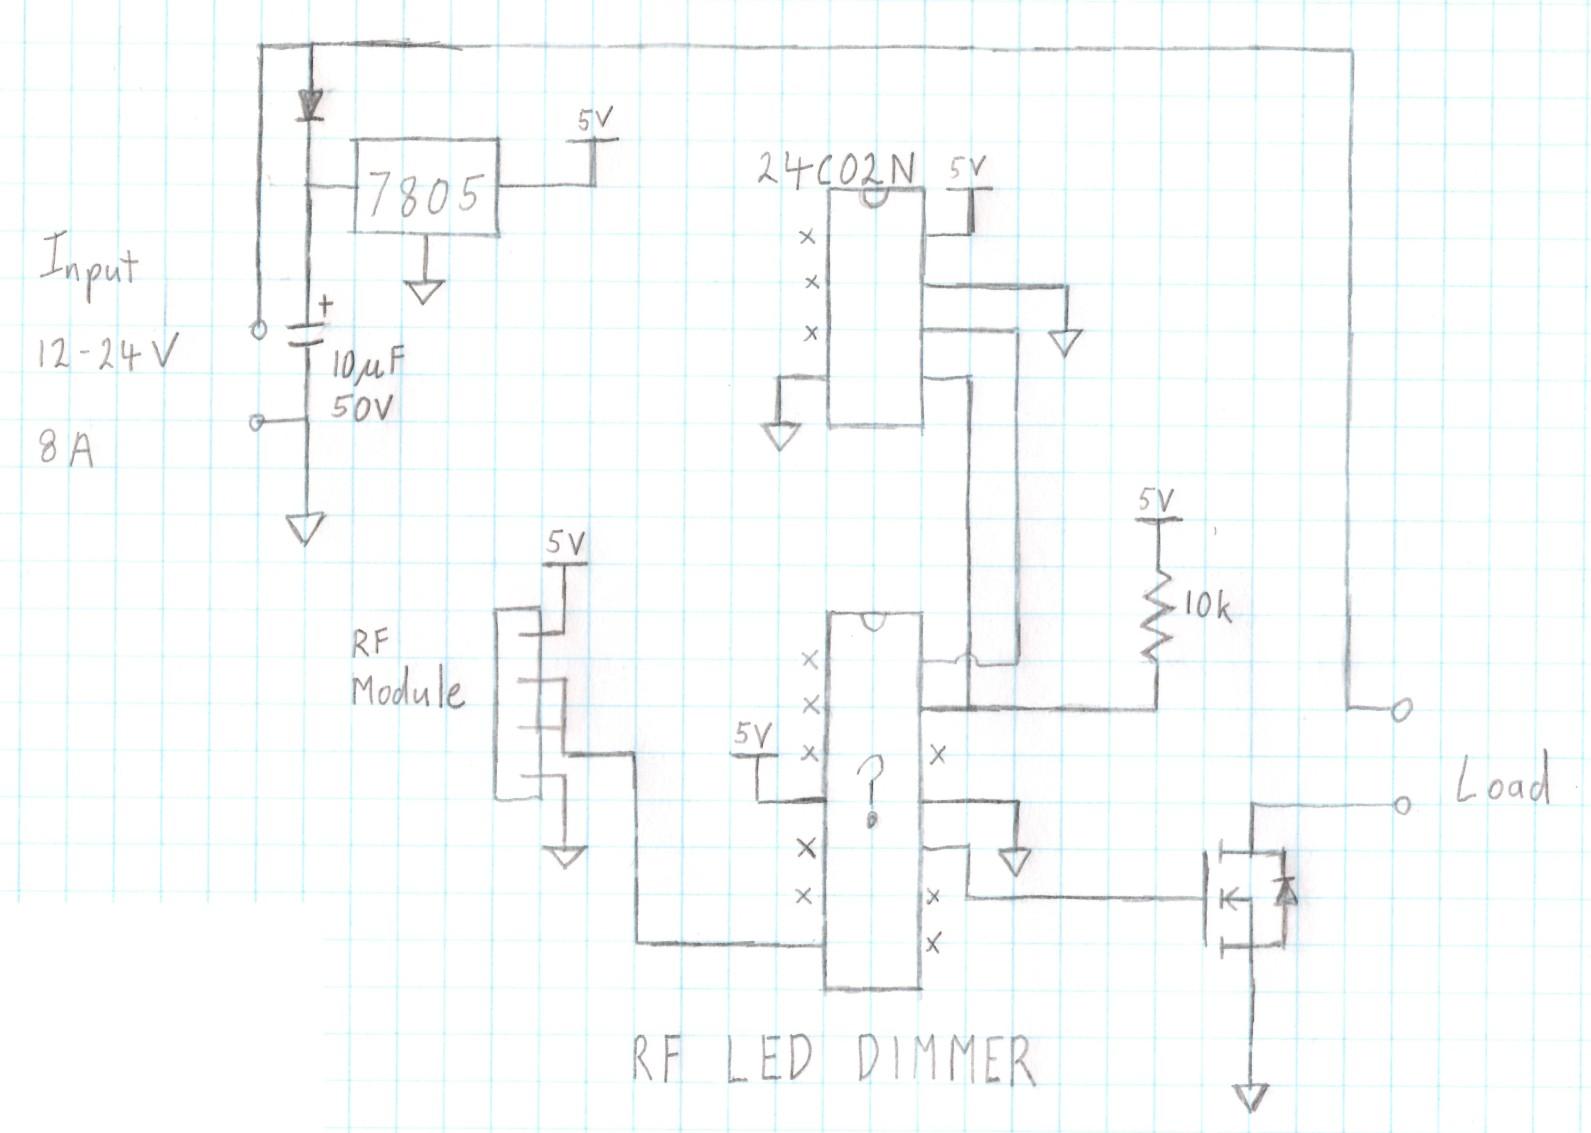 Grant Trebbin Rf Led Dimmer Teardown Module Circuit Diagram Schematic